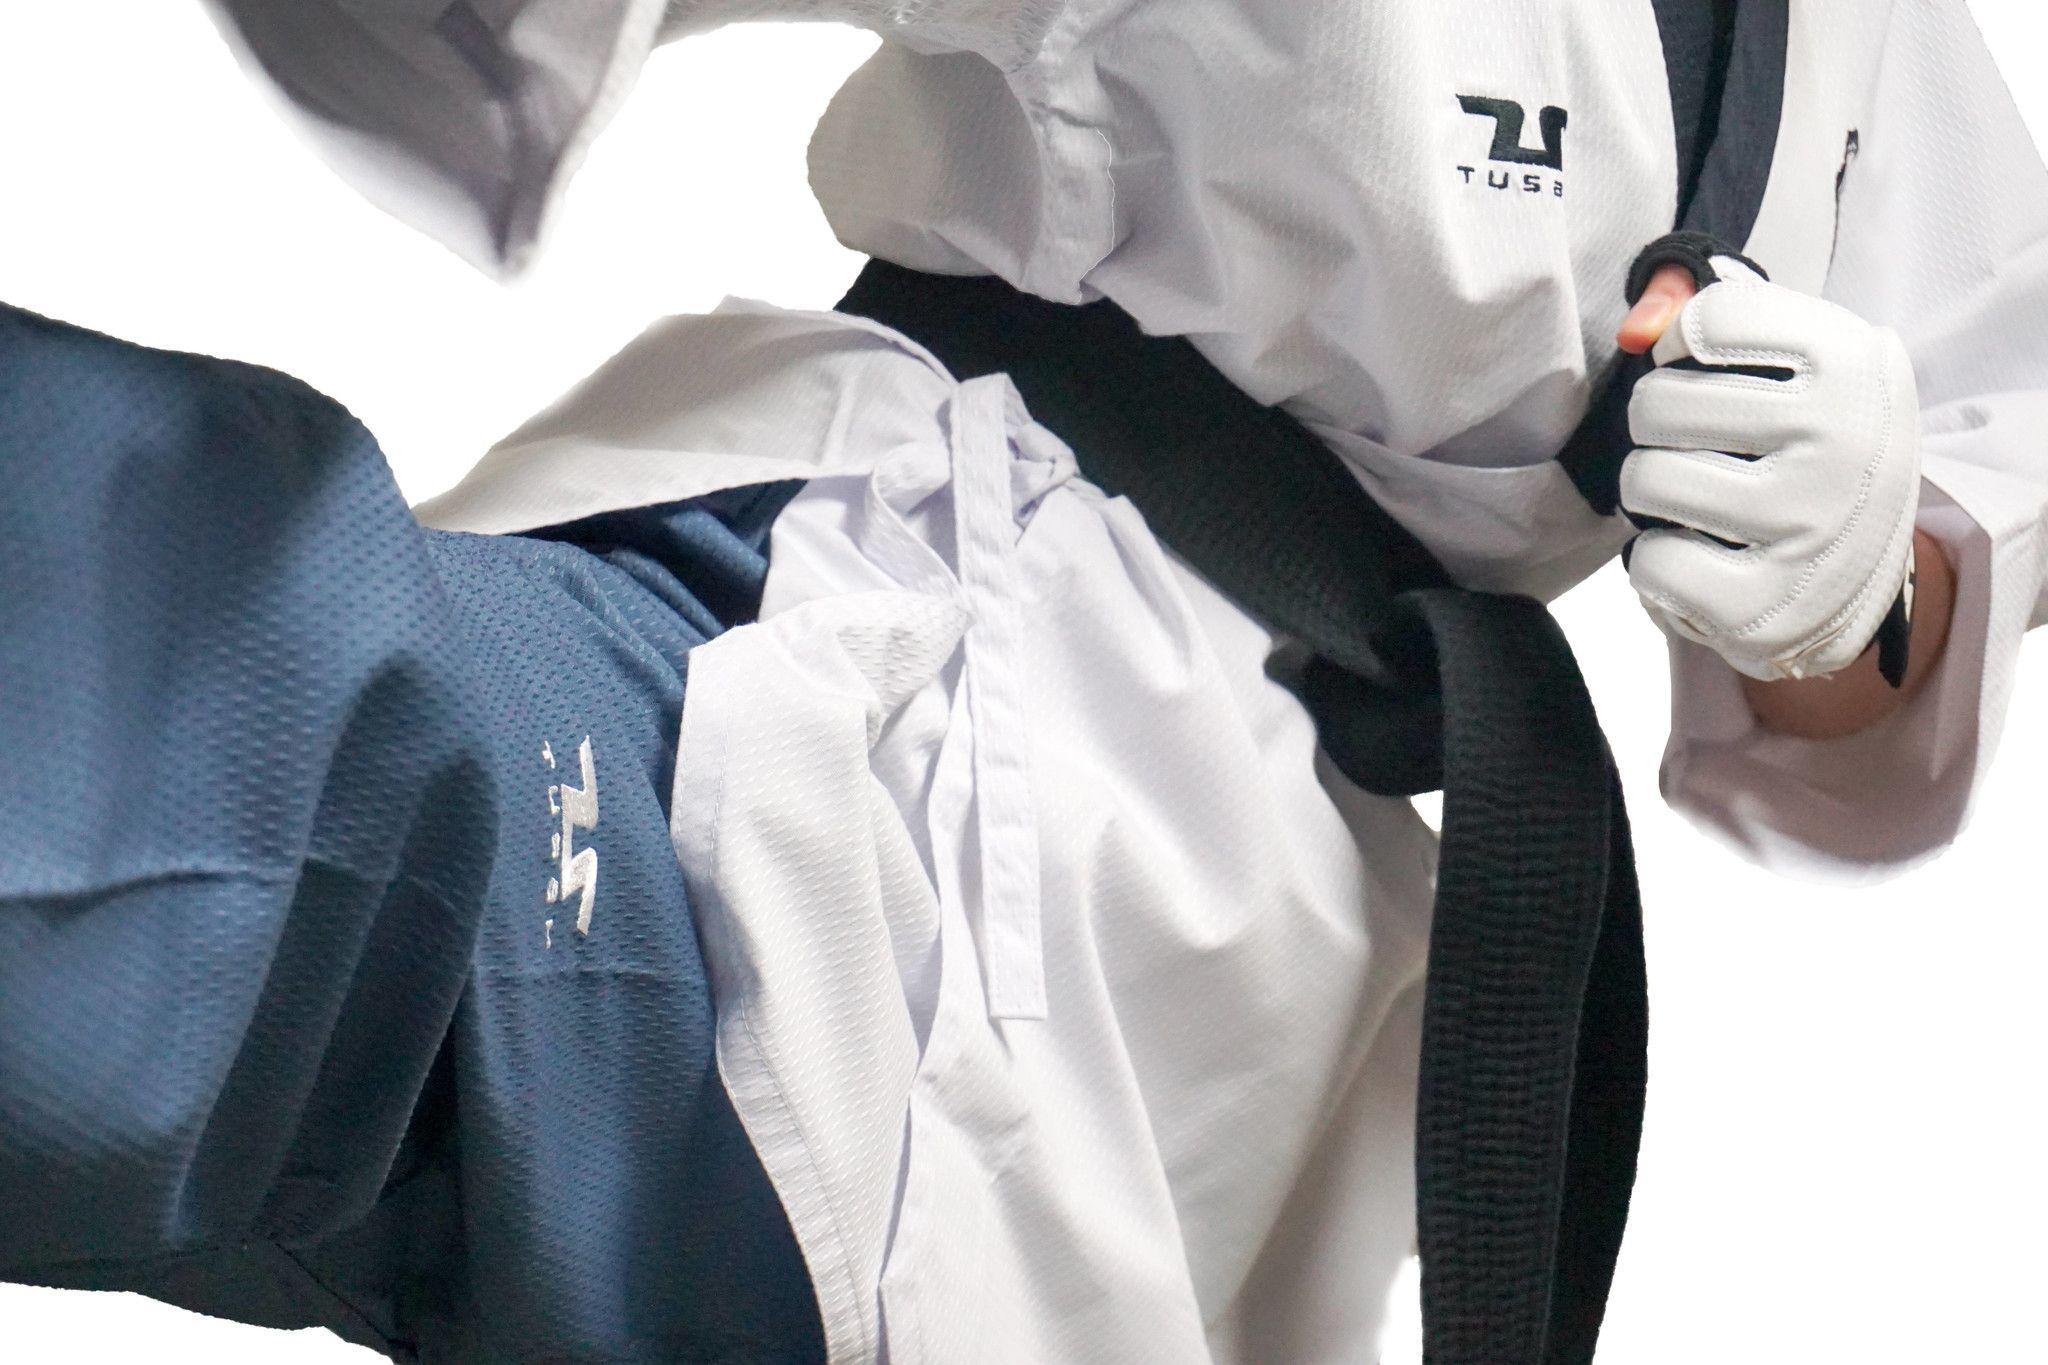 Poomsae Easyfit Poom Maschile TUSAH per Taekwondo OMOLOGATO WT per forme